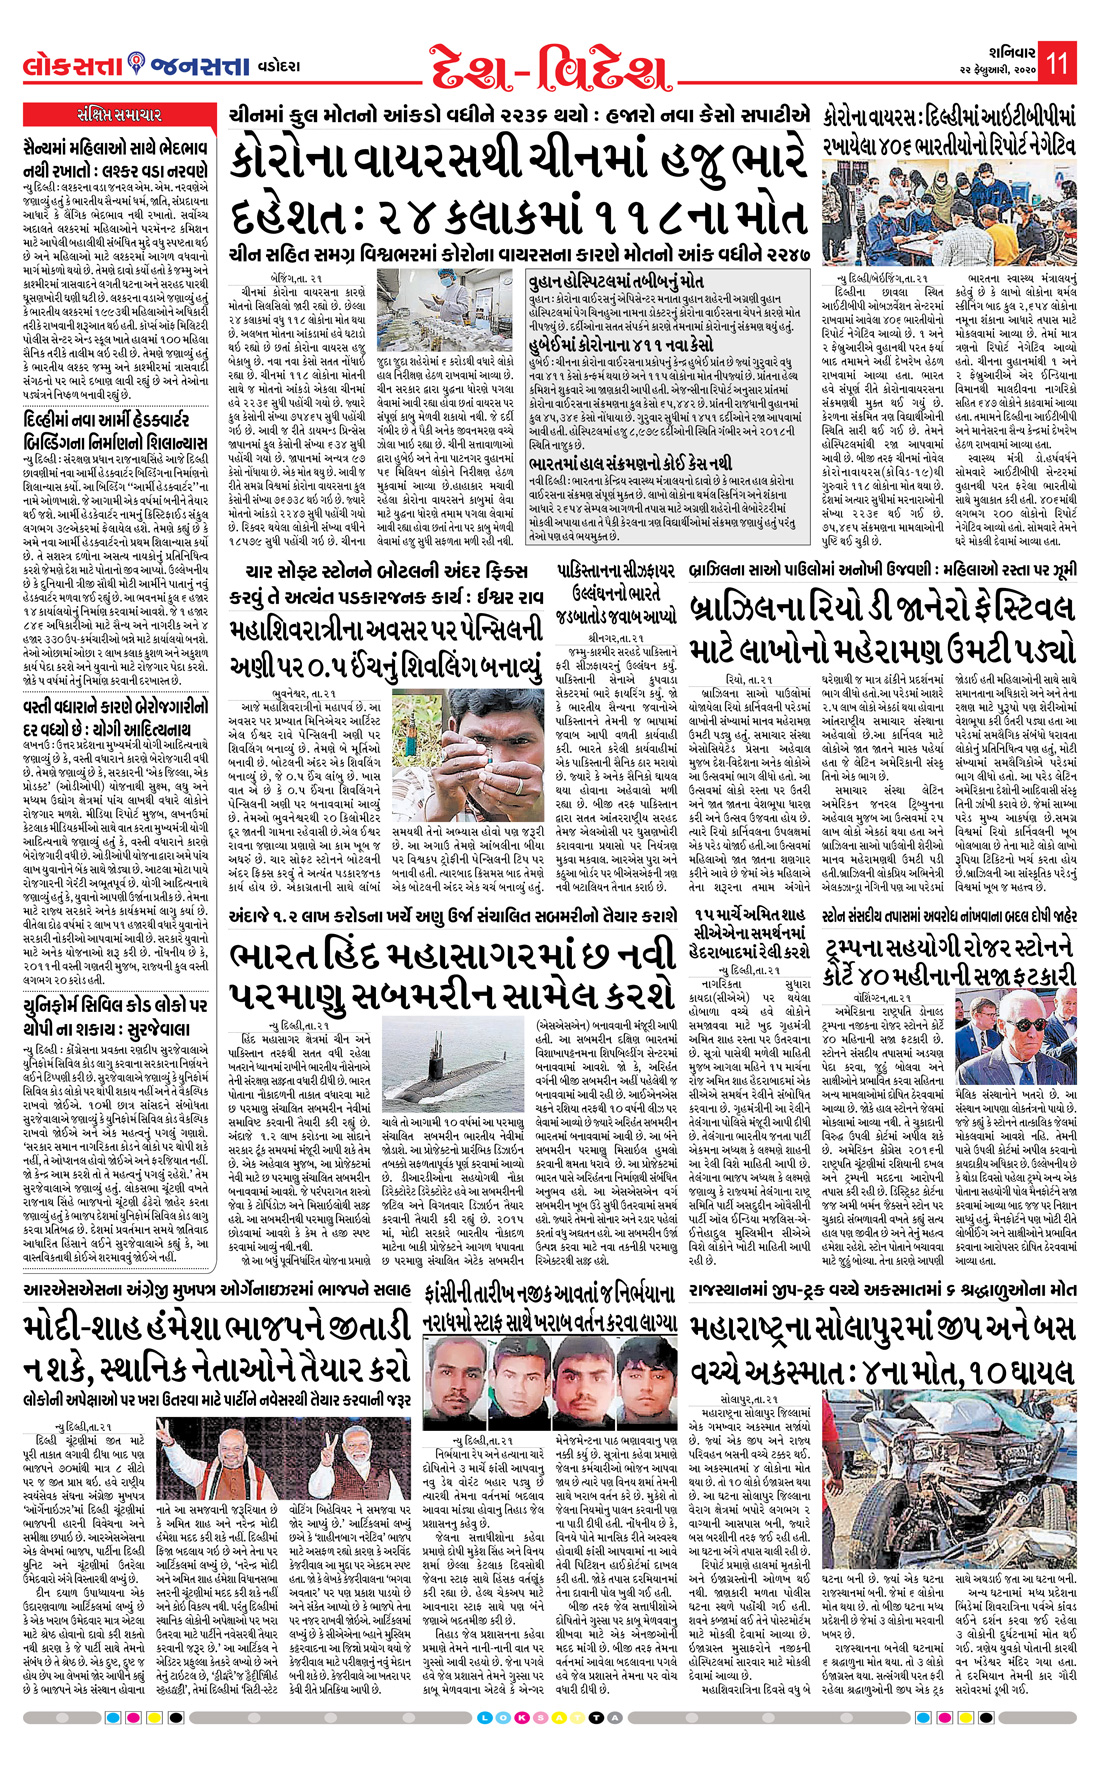 Loksatta Jansatta News Papaer E-paper dated 2020-02-22 | Page 11